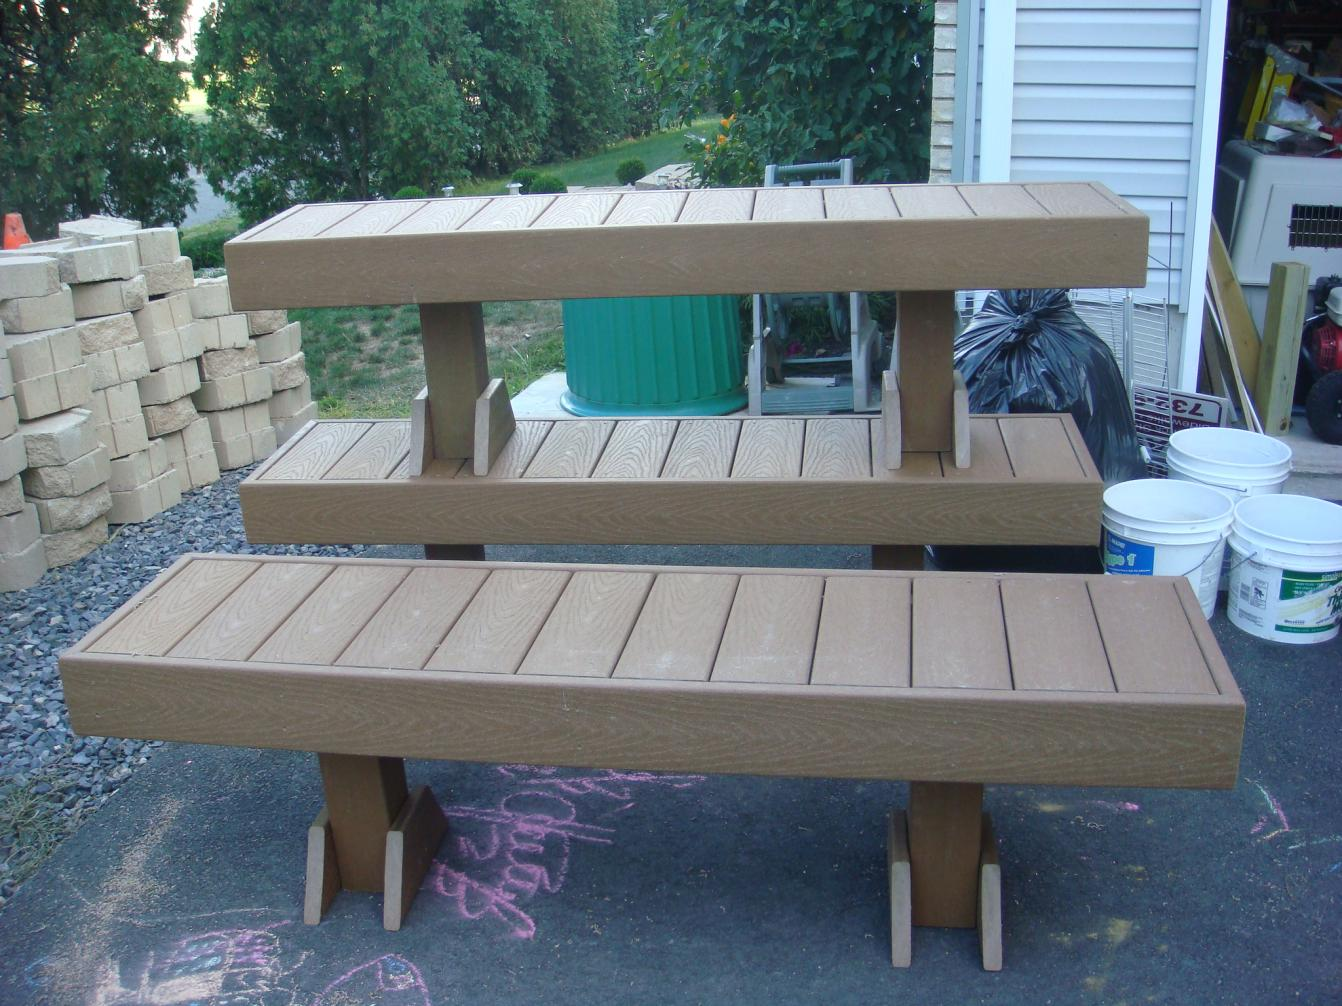 Astonishing Standard Height And Width For Bench On A Deck Decks Lamtechconsult Wood Chair Design Ideas Lamtechconsultcom